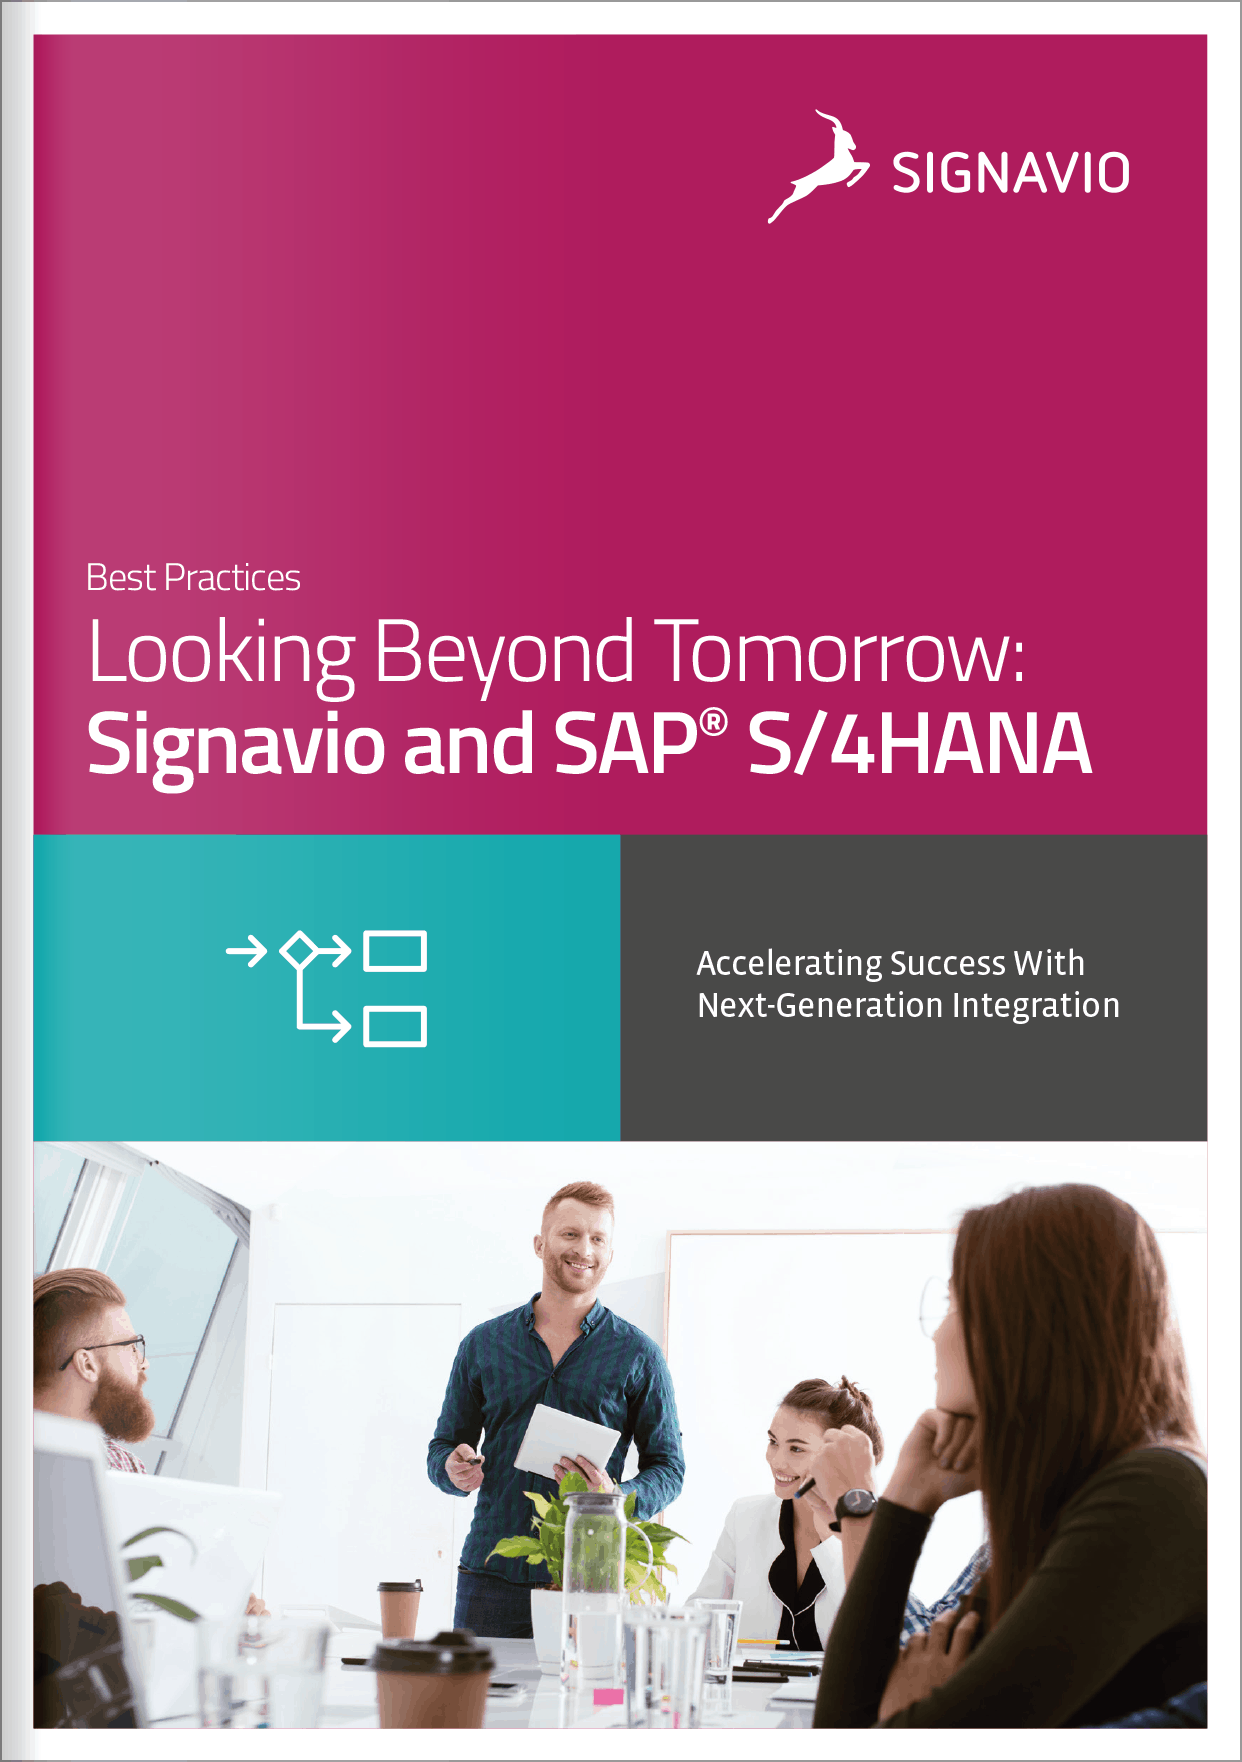 signavio-integration-SAP-S/4HANA